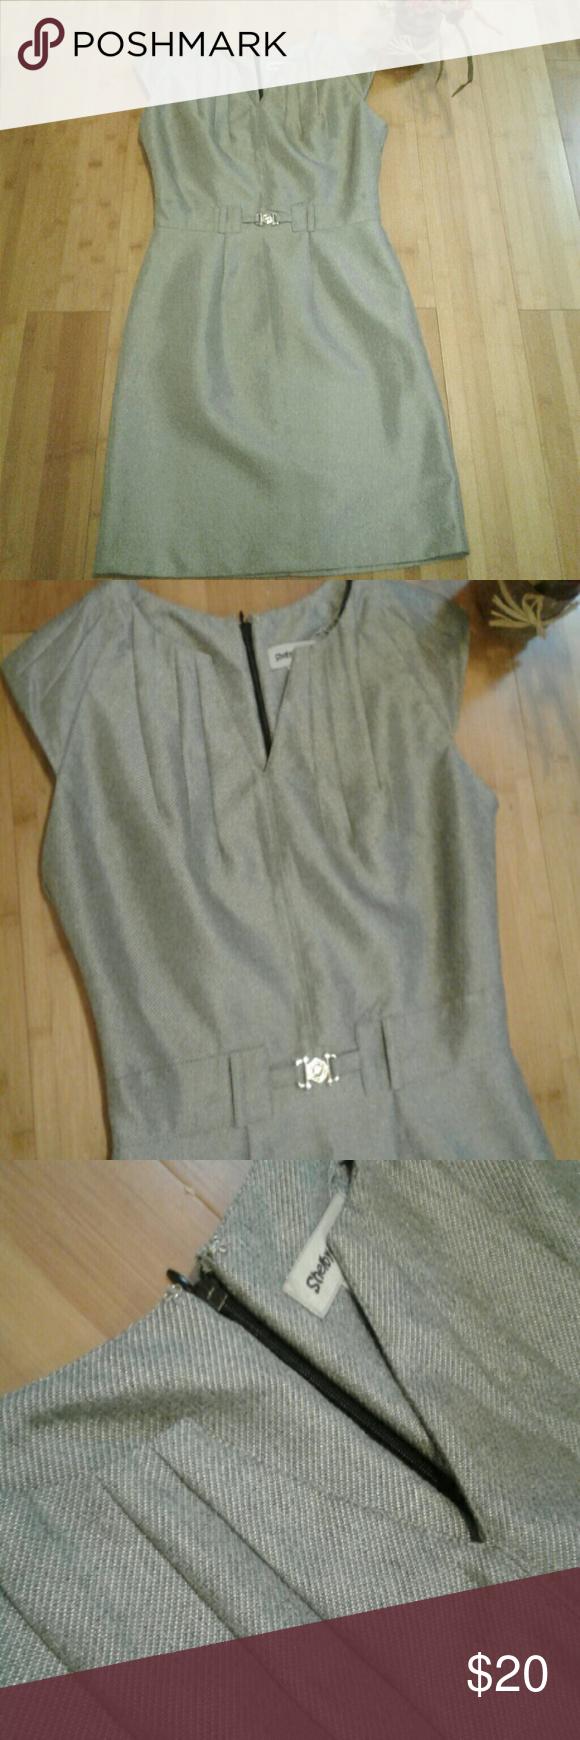 Womens shelby u palmer dress shoulder grey and customer support